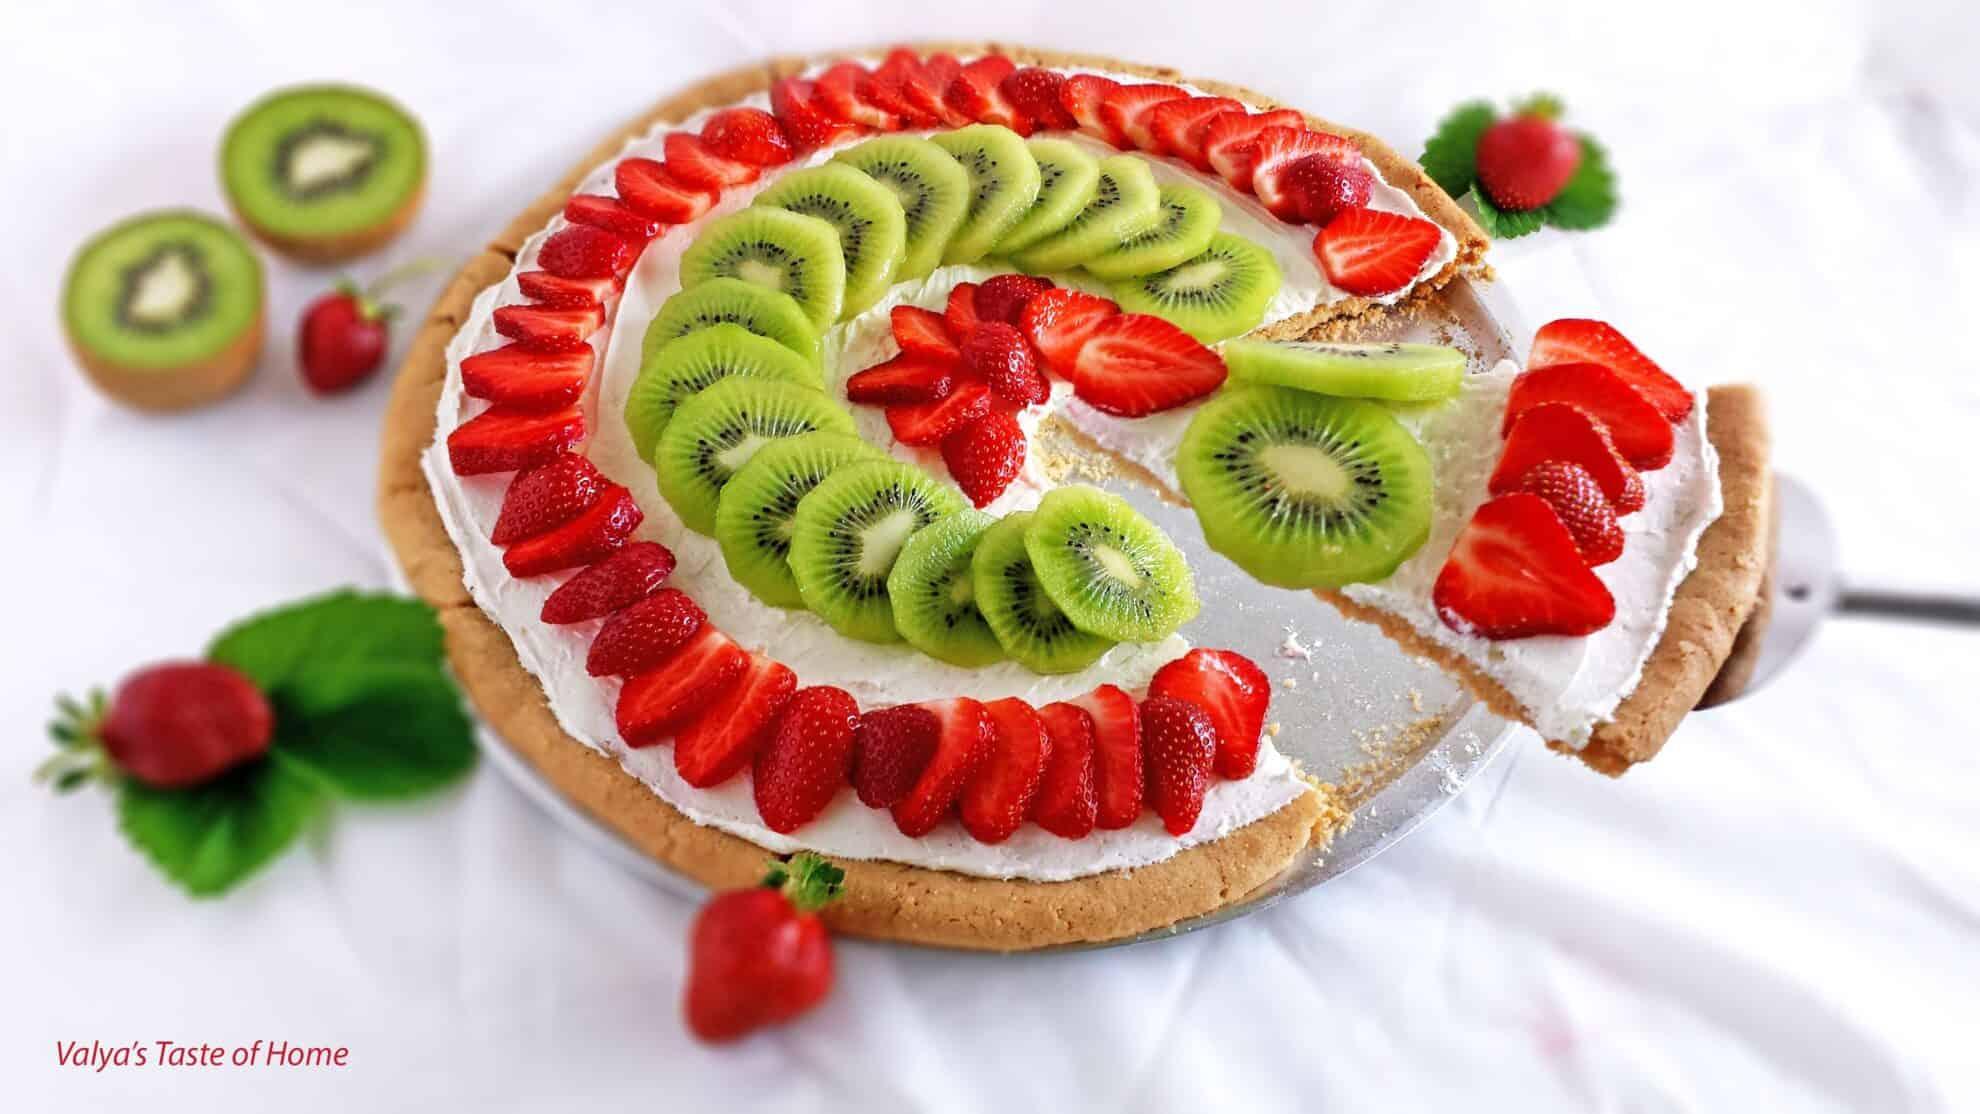 Strawberry Kiwi Dessert Pizza 171 Valya S Taste Of Home